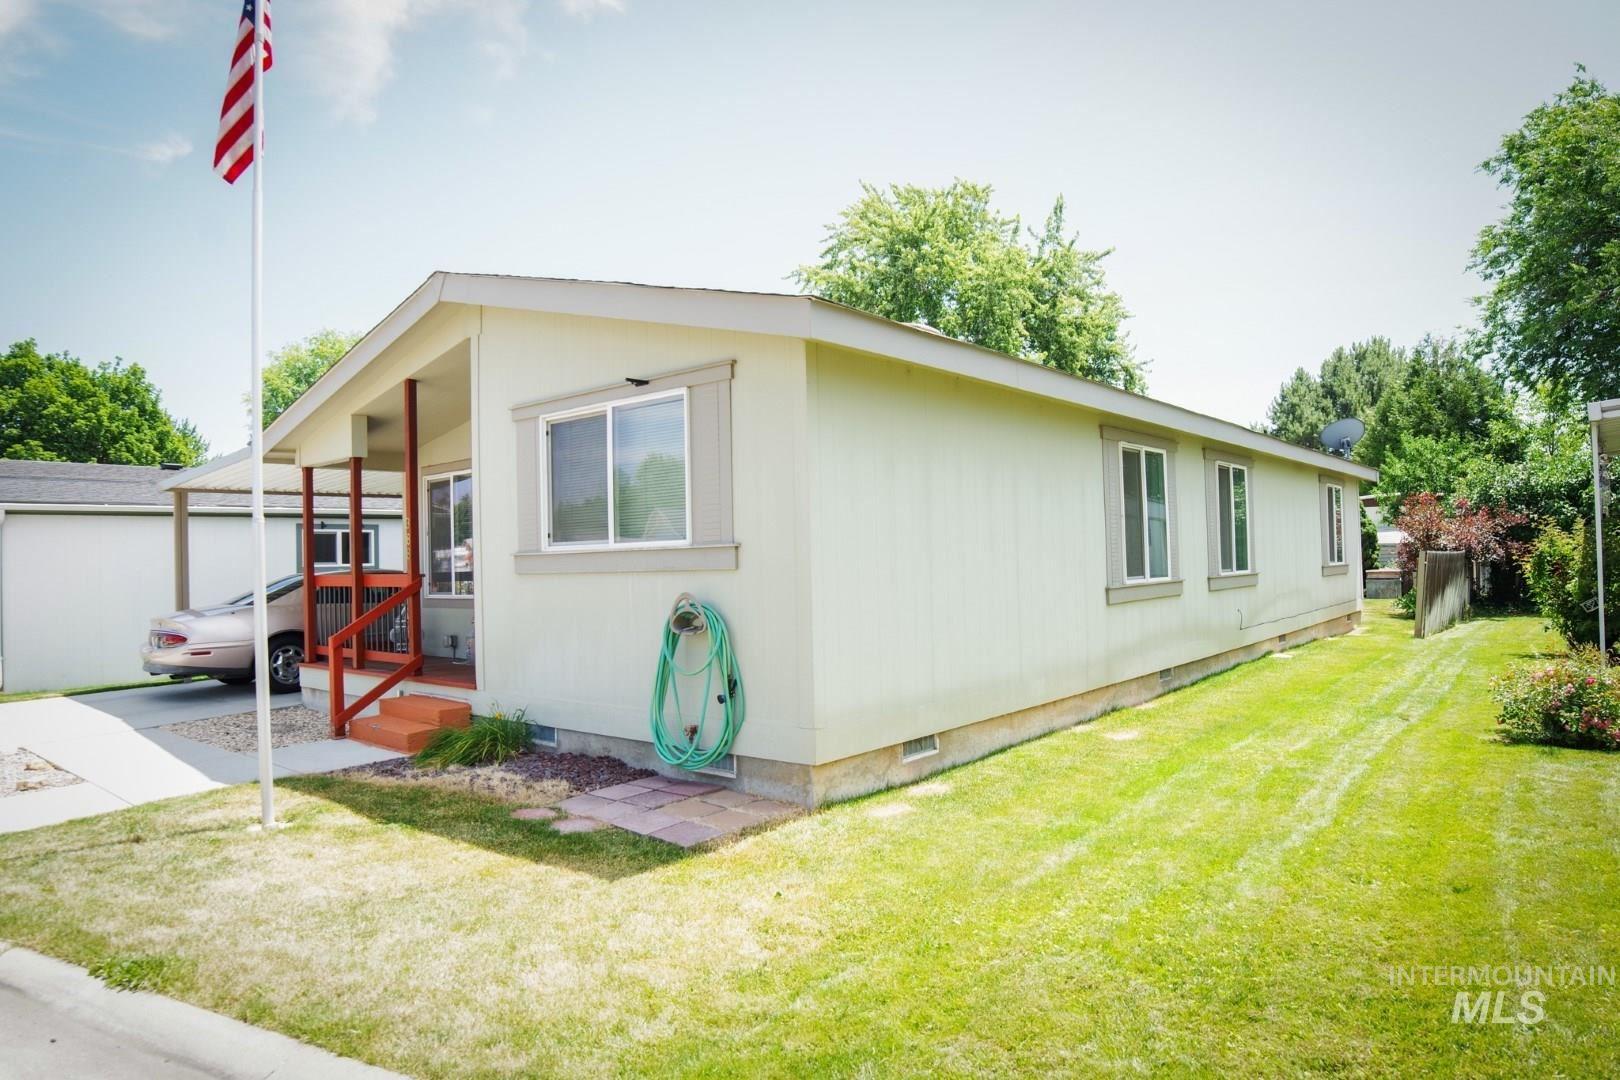 388 Silver City Dr, Boise, ID 83713 - MLS#: 98773094